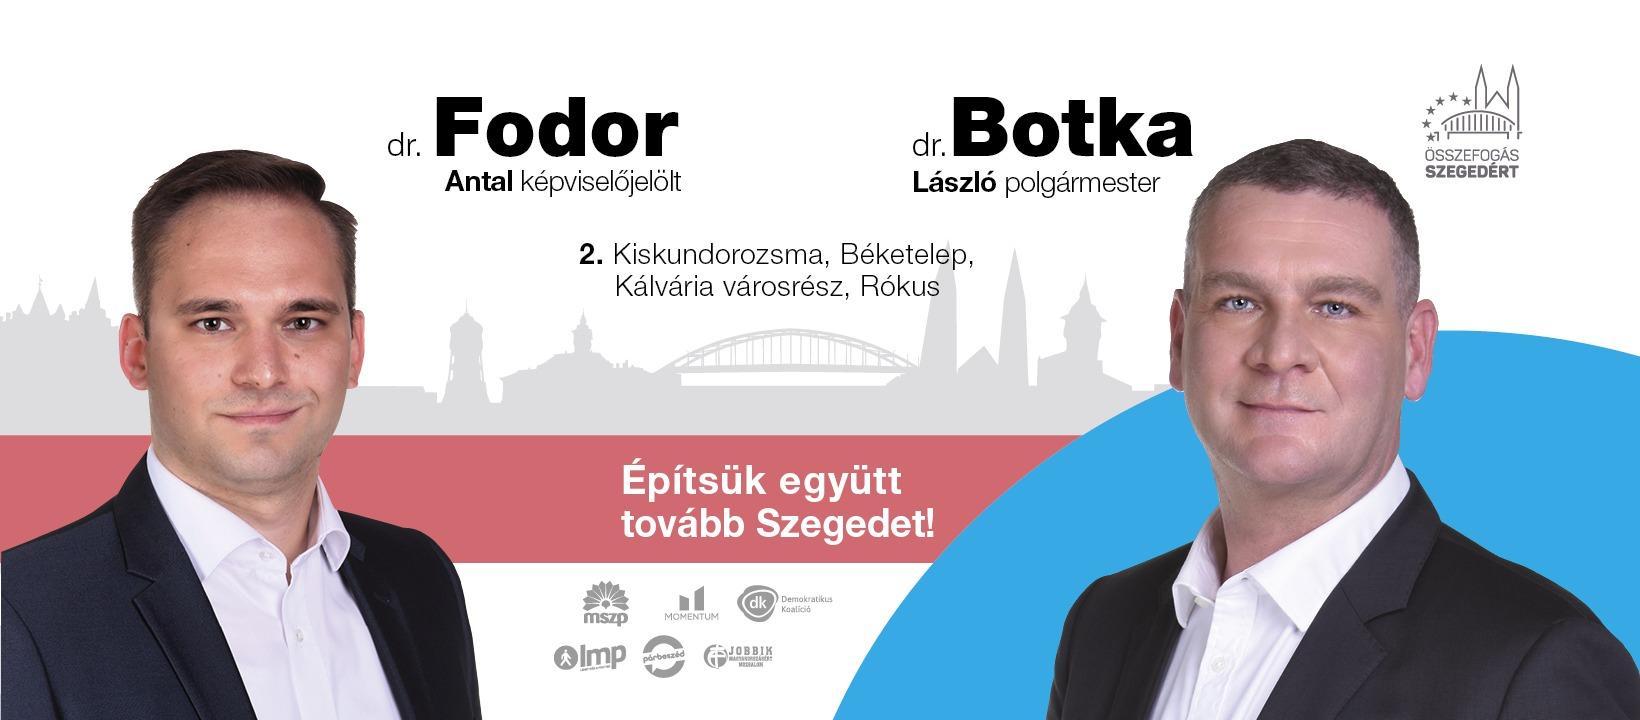 dr. Fodor Antal